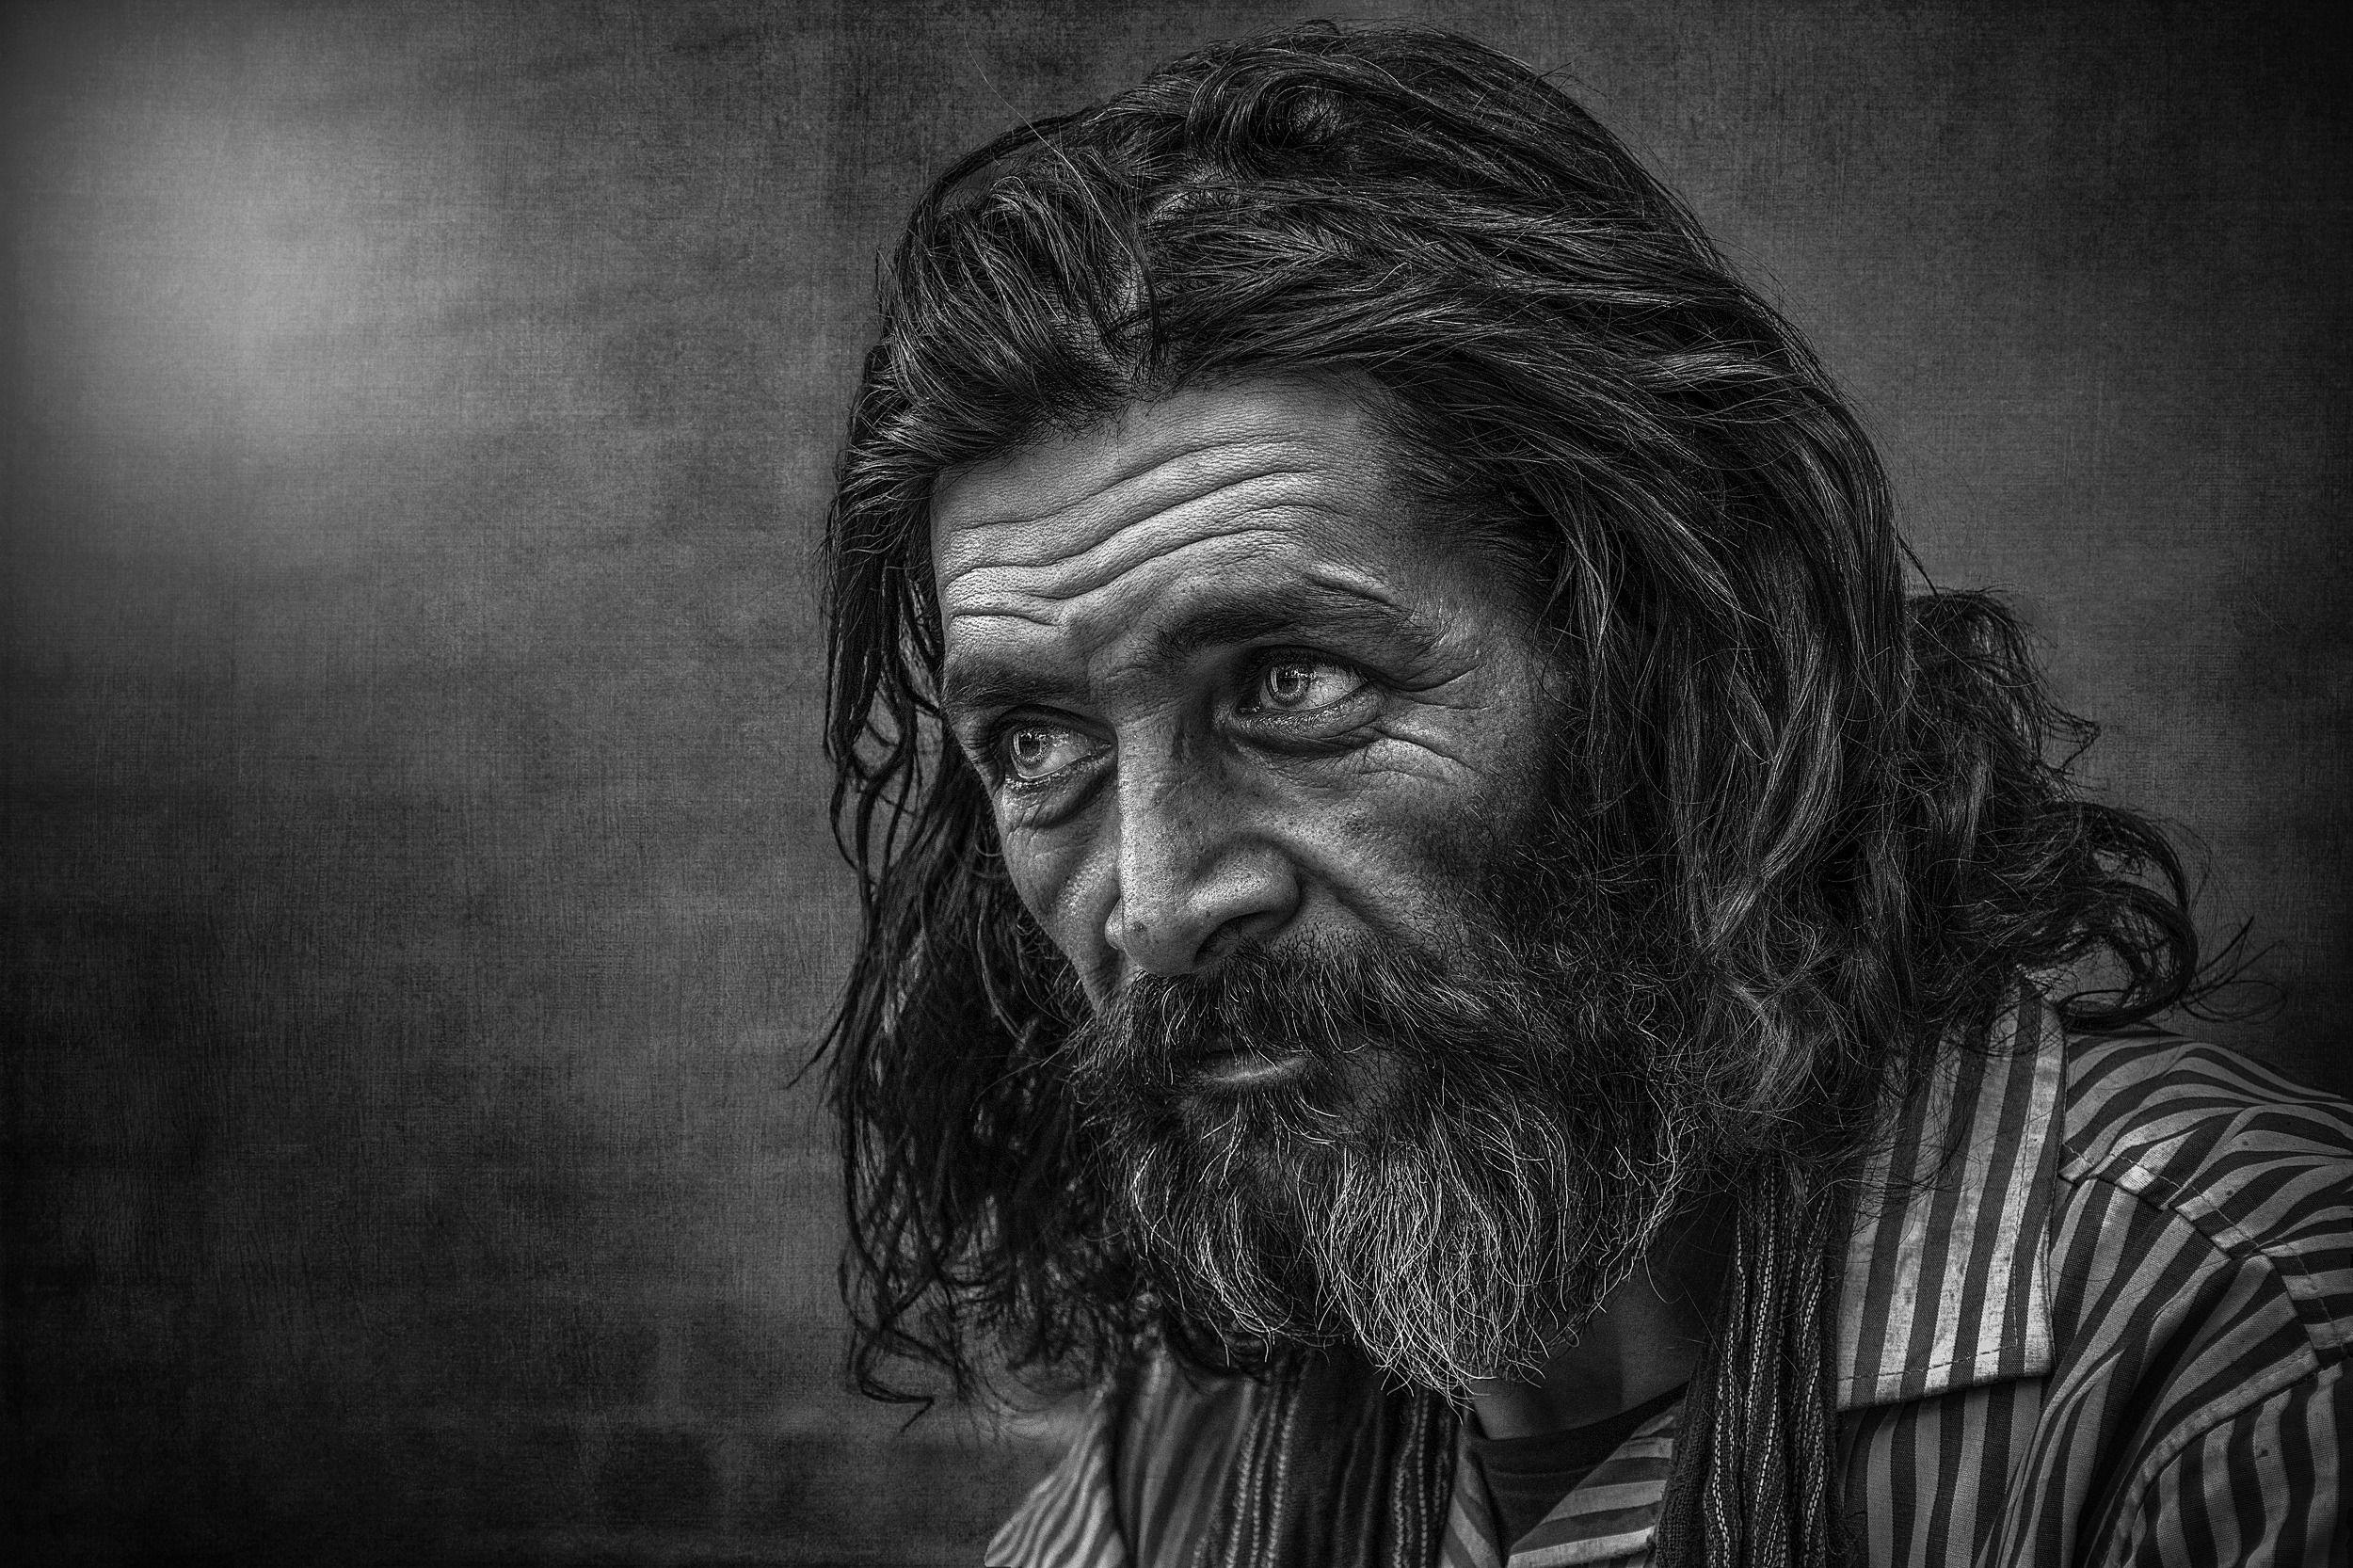 #people, #portrait, #bread, #look, #face, #skin, #dark, #human, Zavvar Mehdi